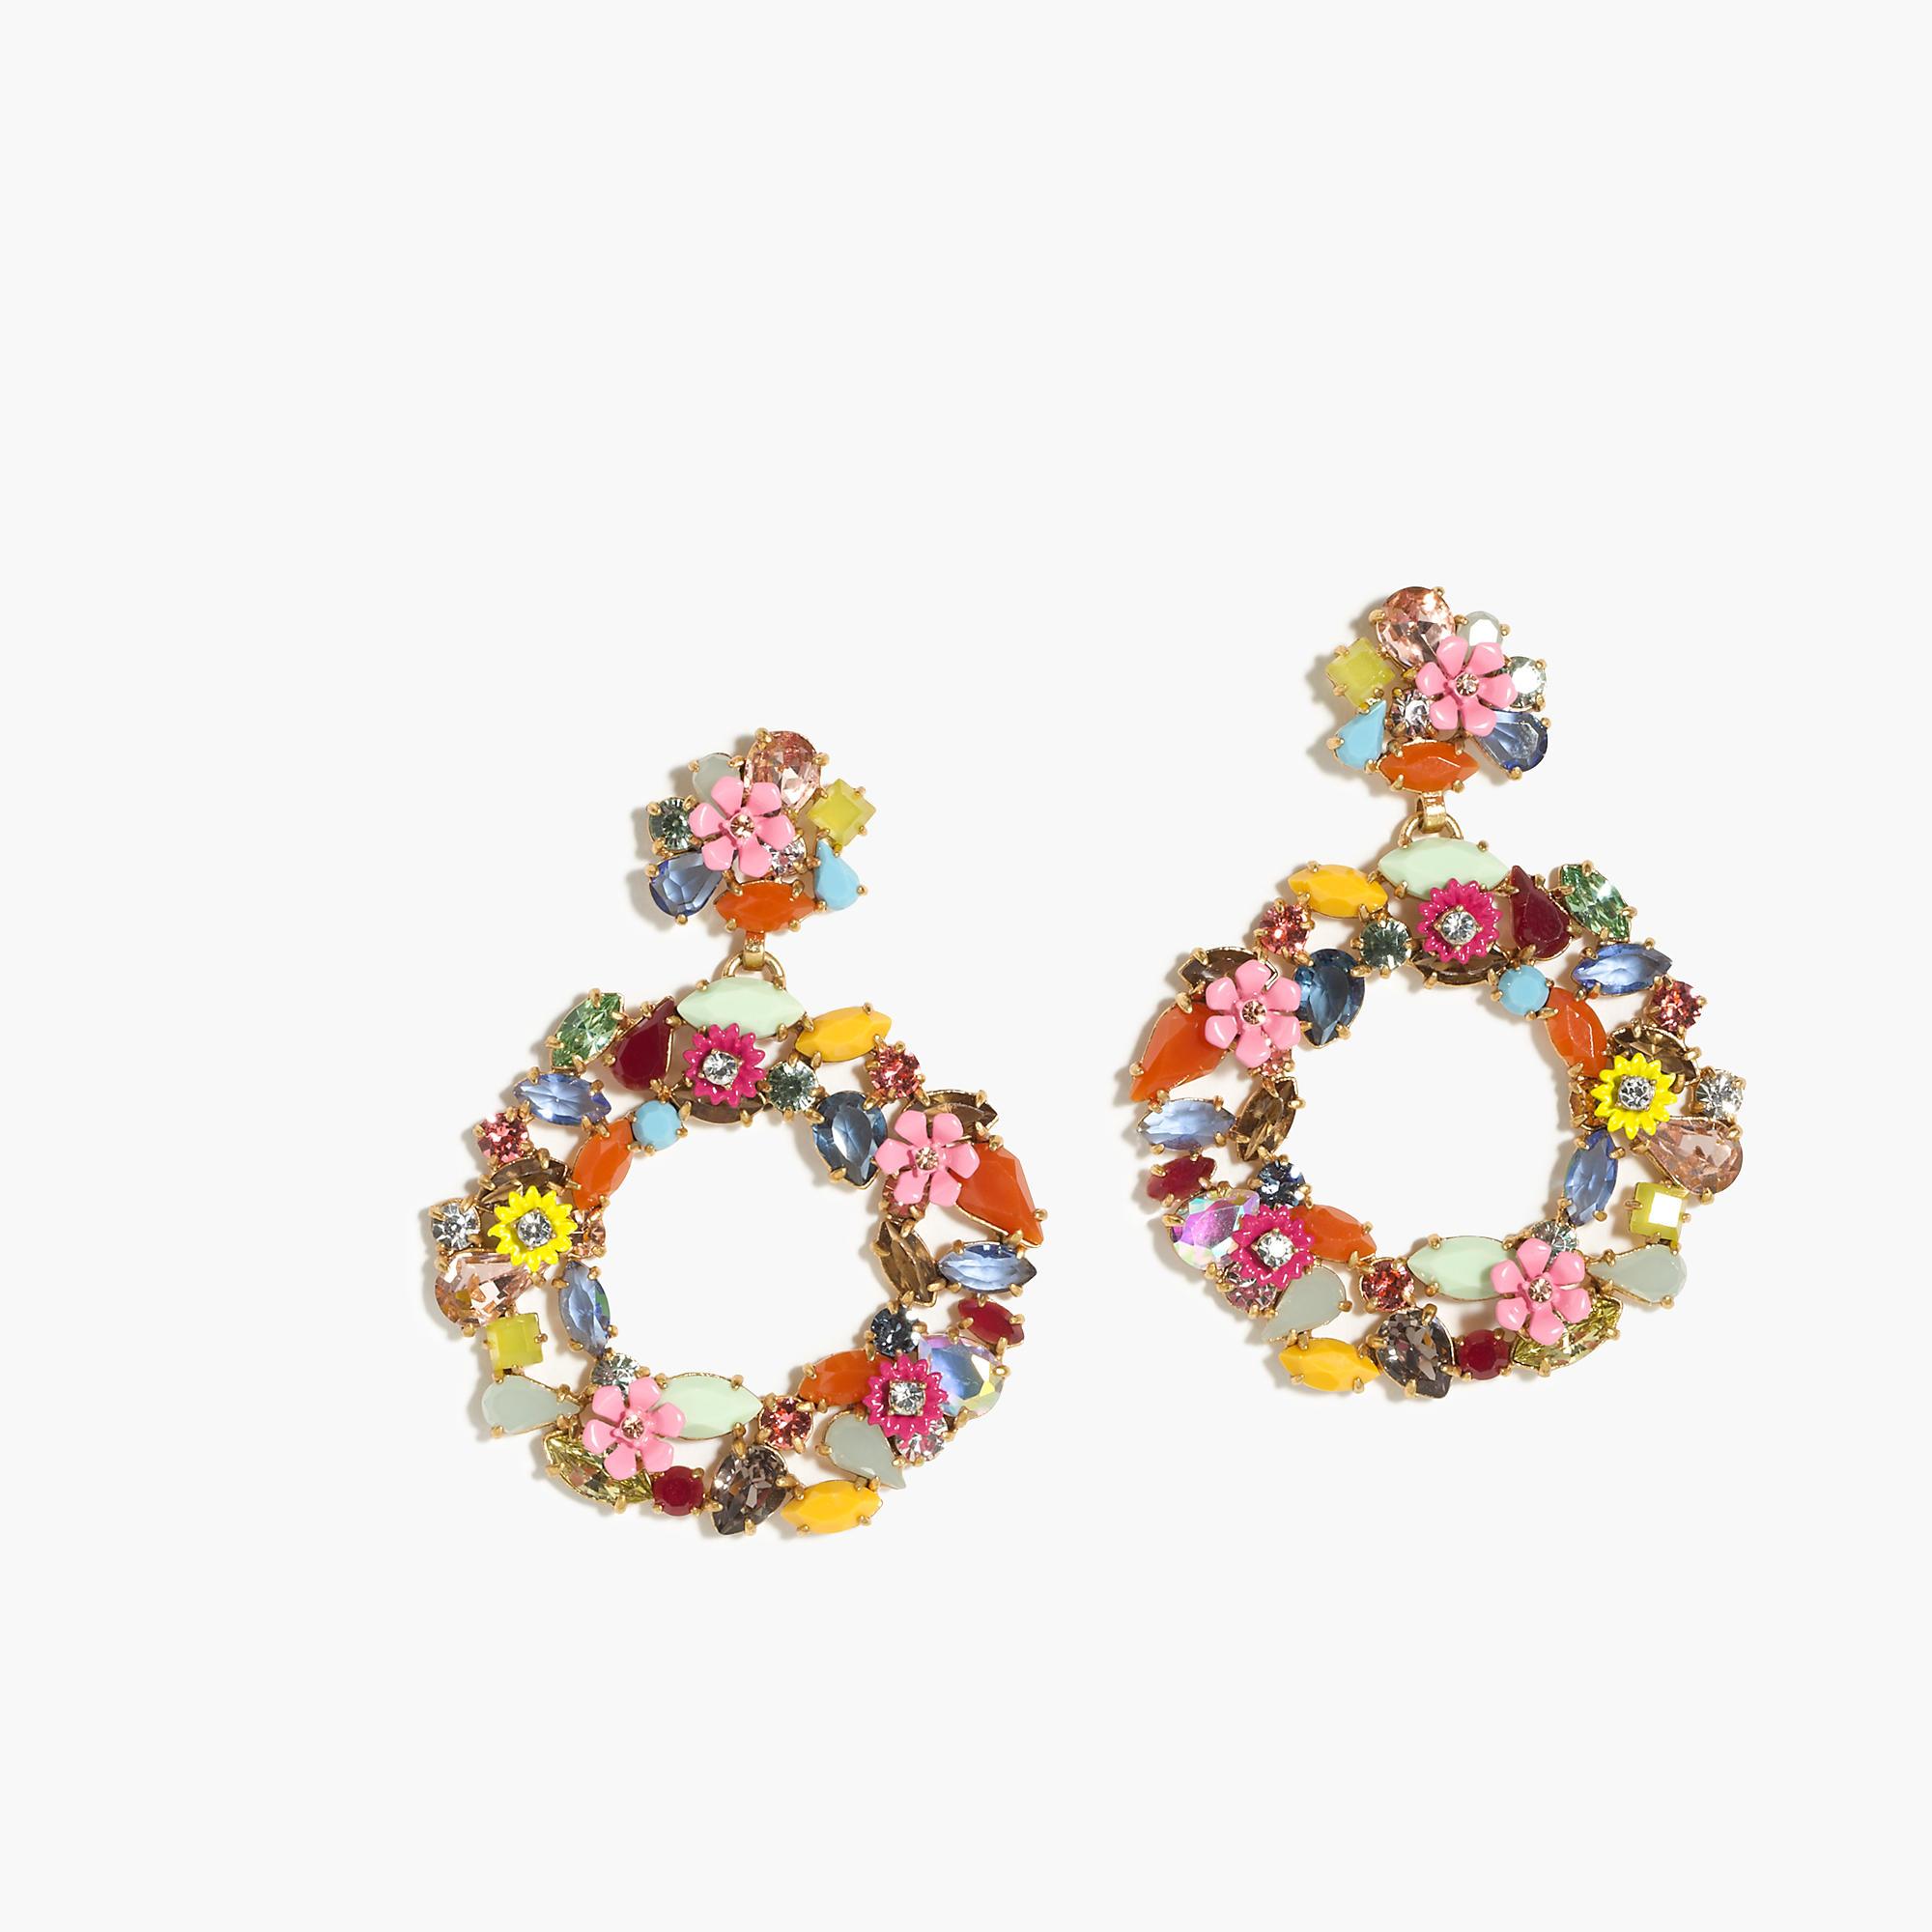 Colorful Floral Hoop Earrings  Women Earrings  Jcrew. Baguette Bands. Eternity Band Wedding Rings. Bauble Beads. Love Knot Stud Earrings. Skull Engagement Rings. Leverback. Marquise Stud Earrings. Light Weight Chains